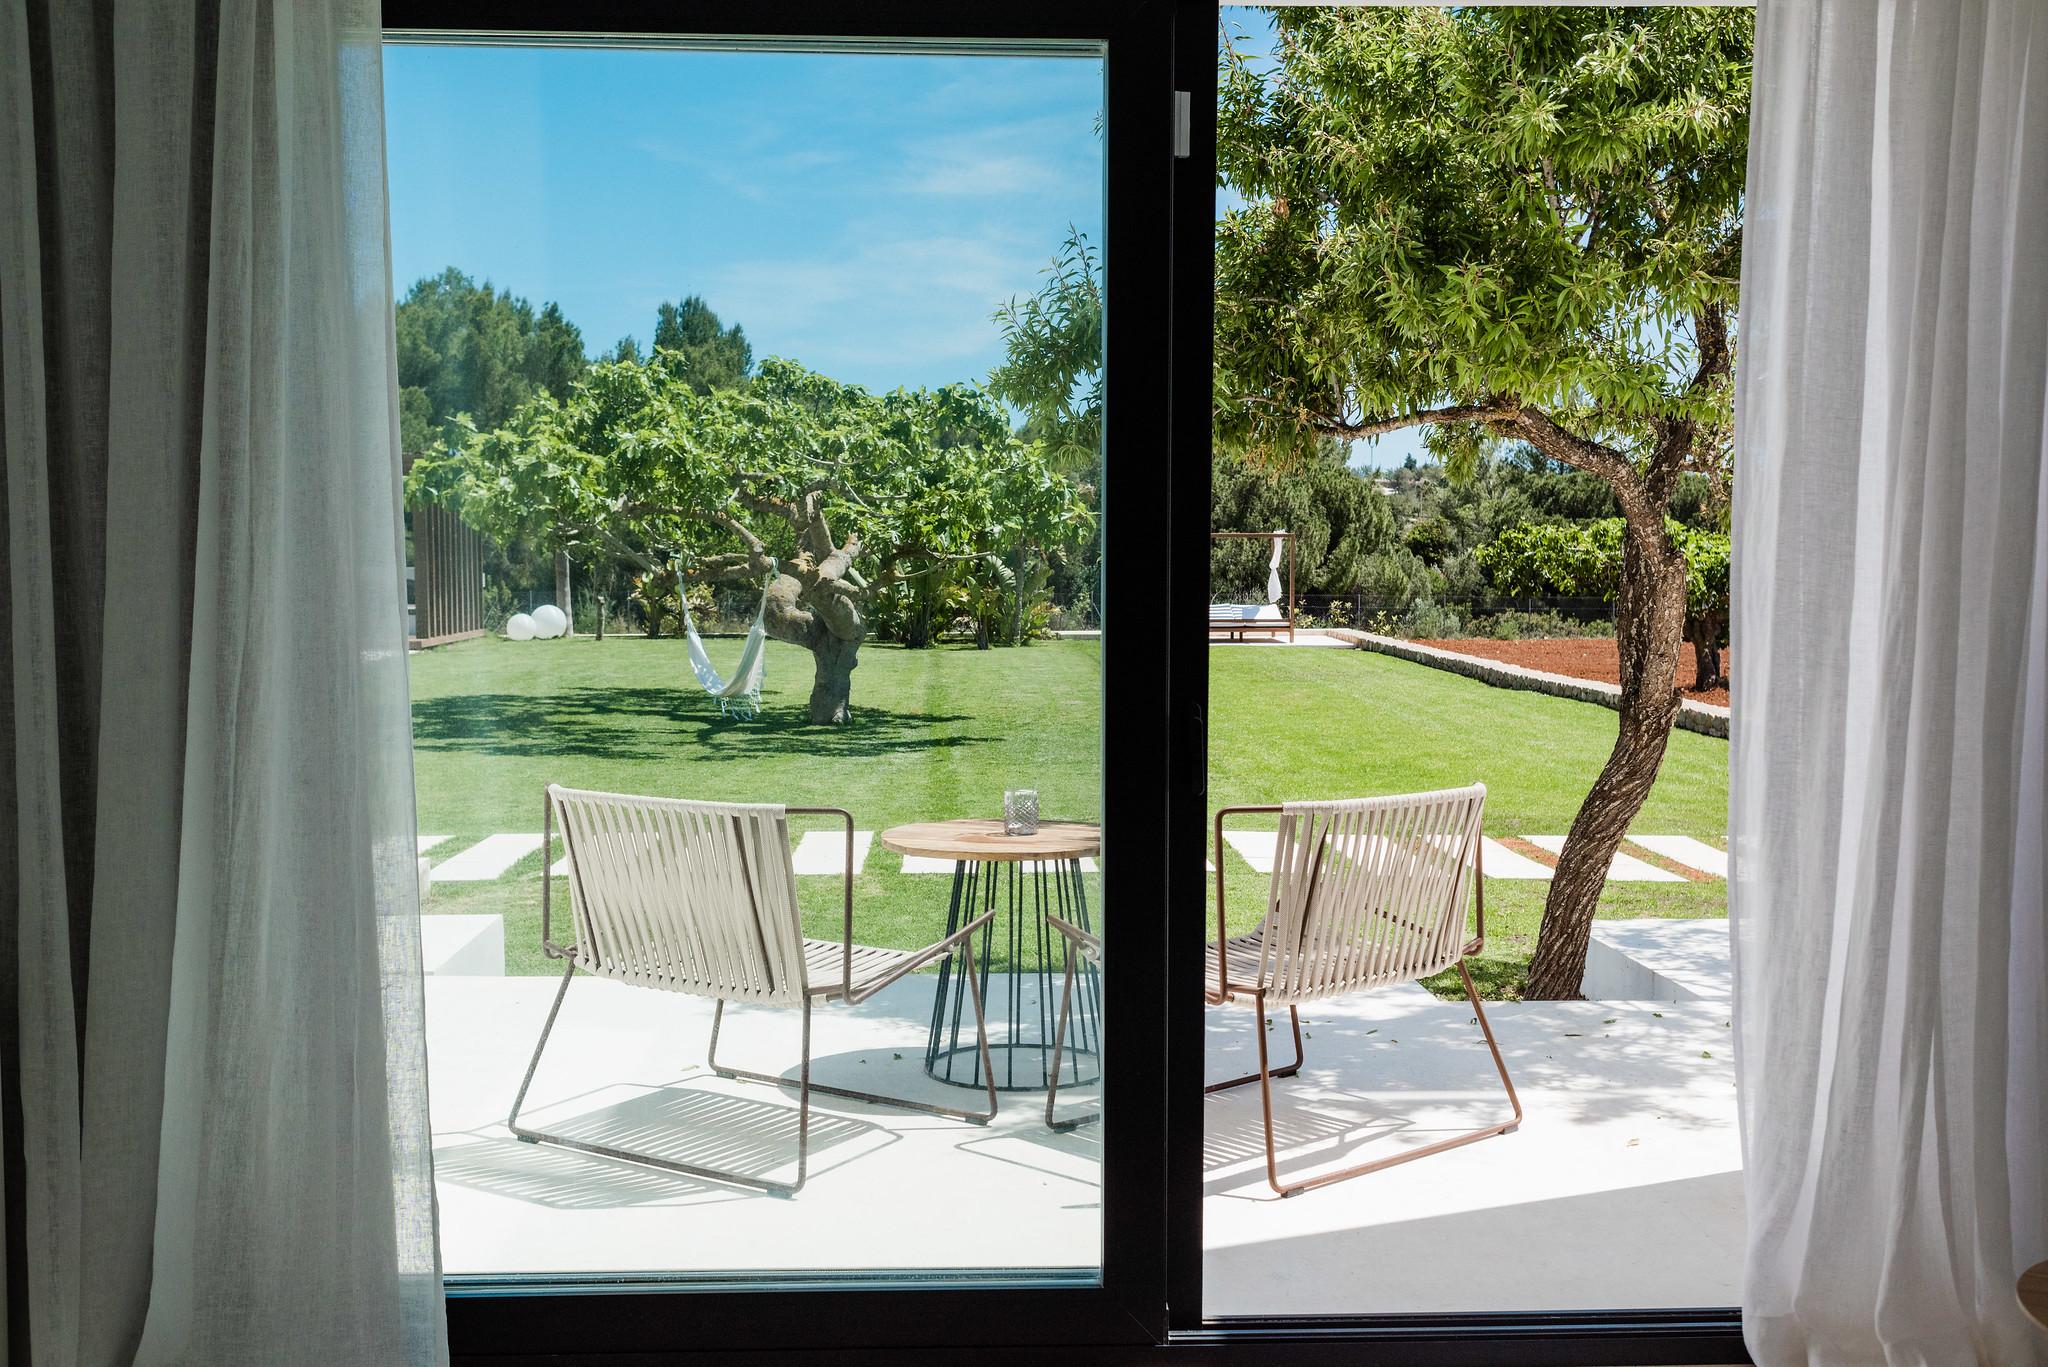 https://www.white-ibiza.com/wp-content/uploads/2020/06/white-ibiza-villas-can-carmen-interior1.jpg